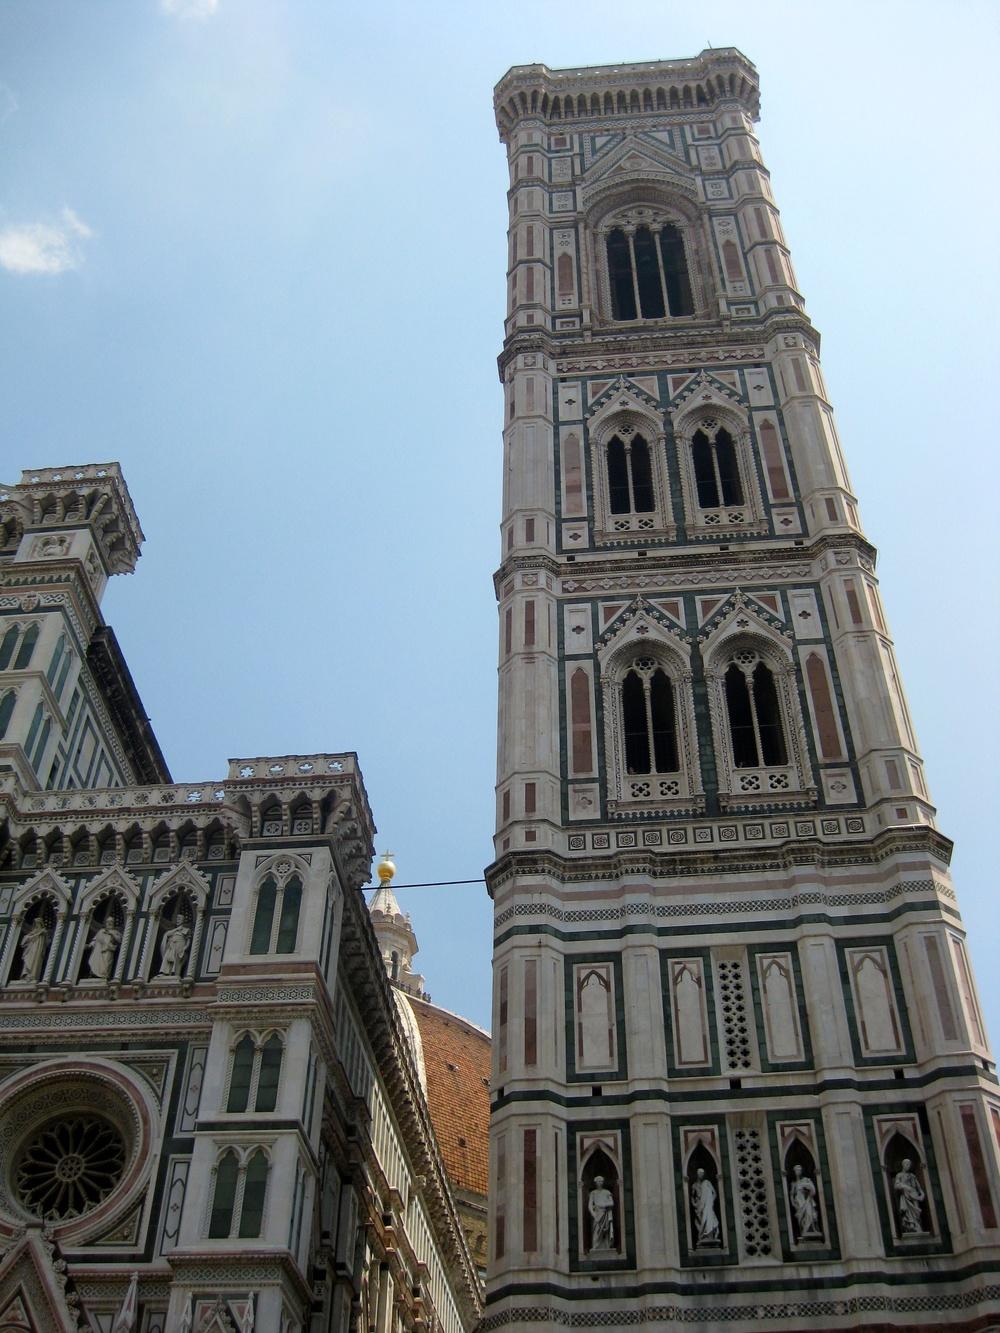 CRO Italy web 2013 - 033.jpg